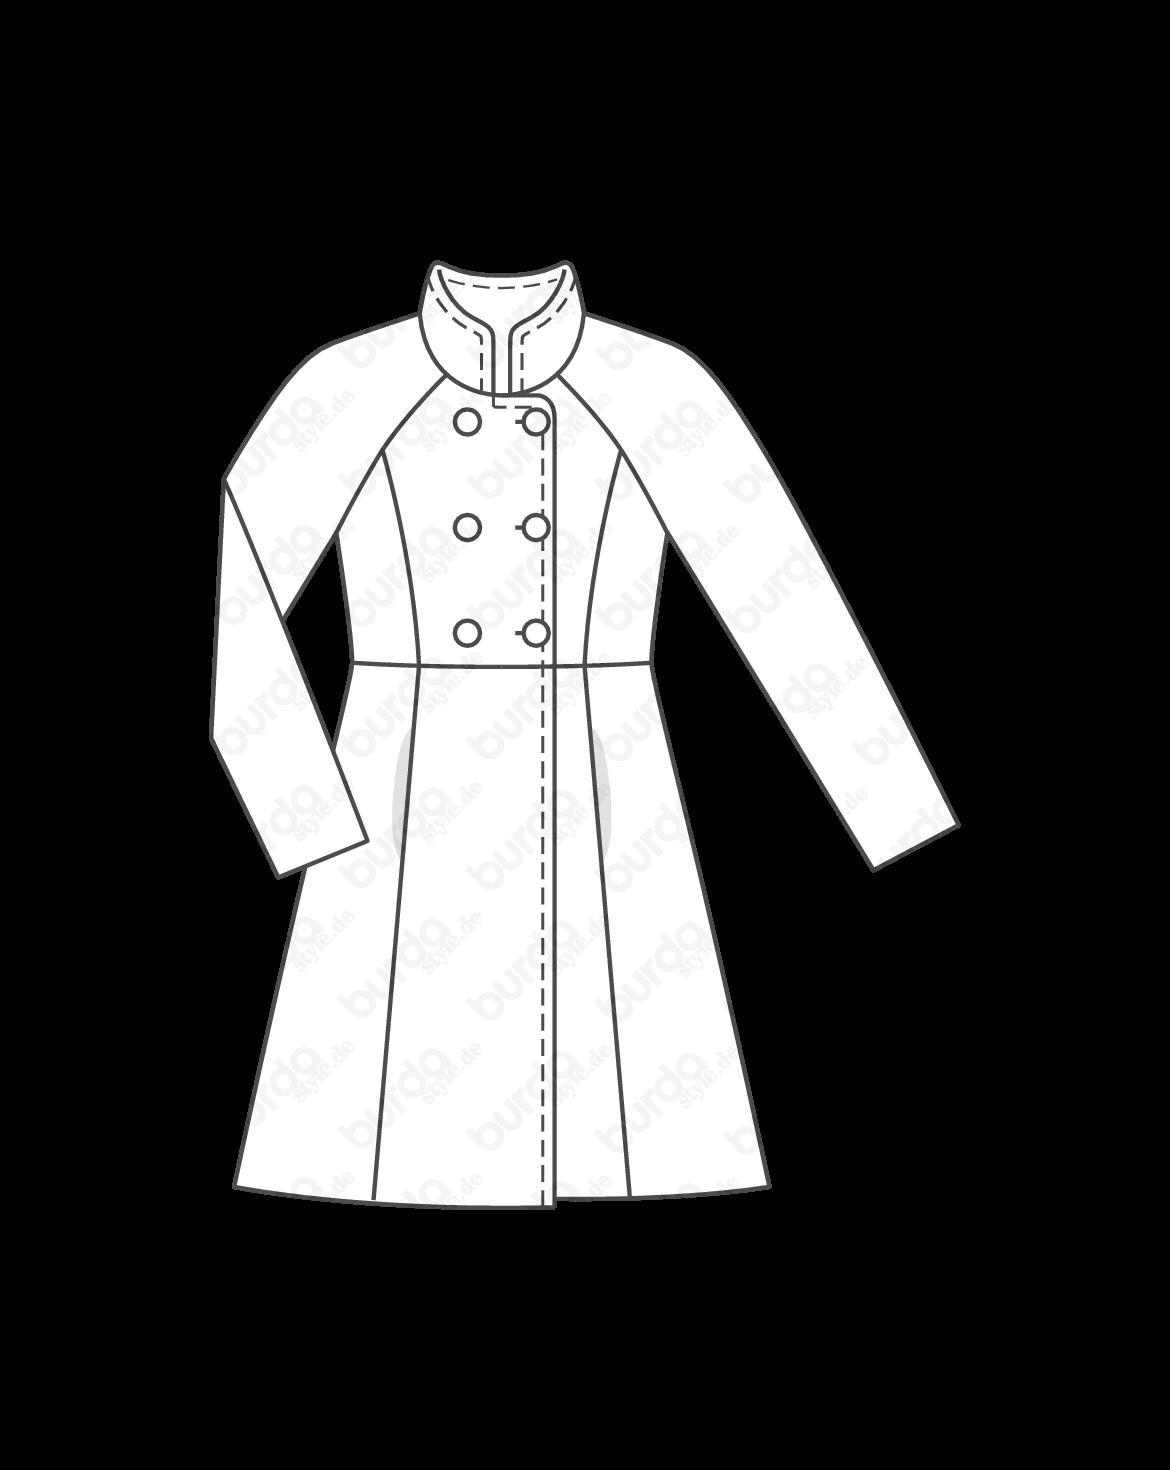 Stehkragen mantel schnittmuster